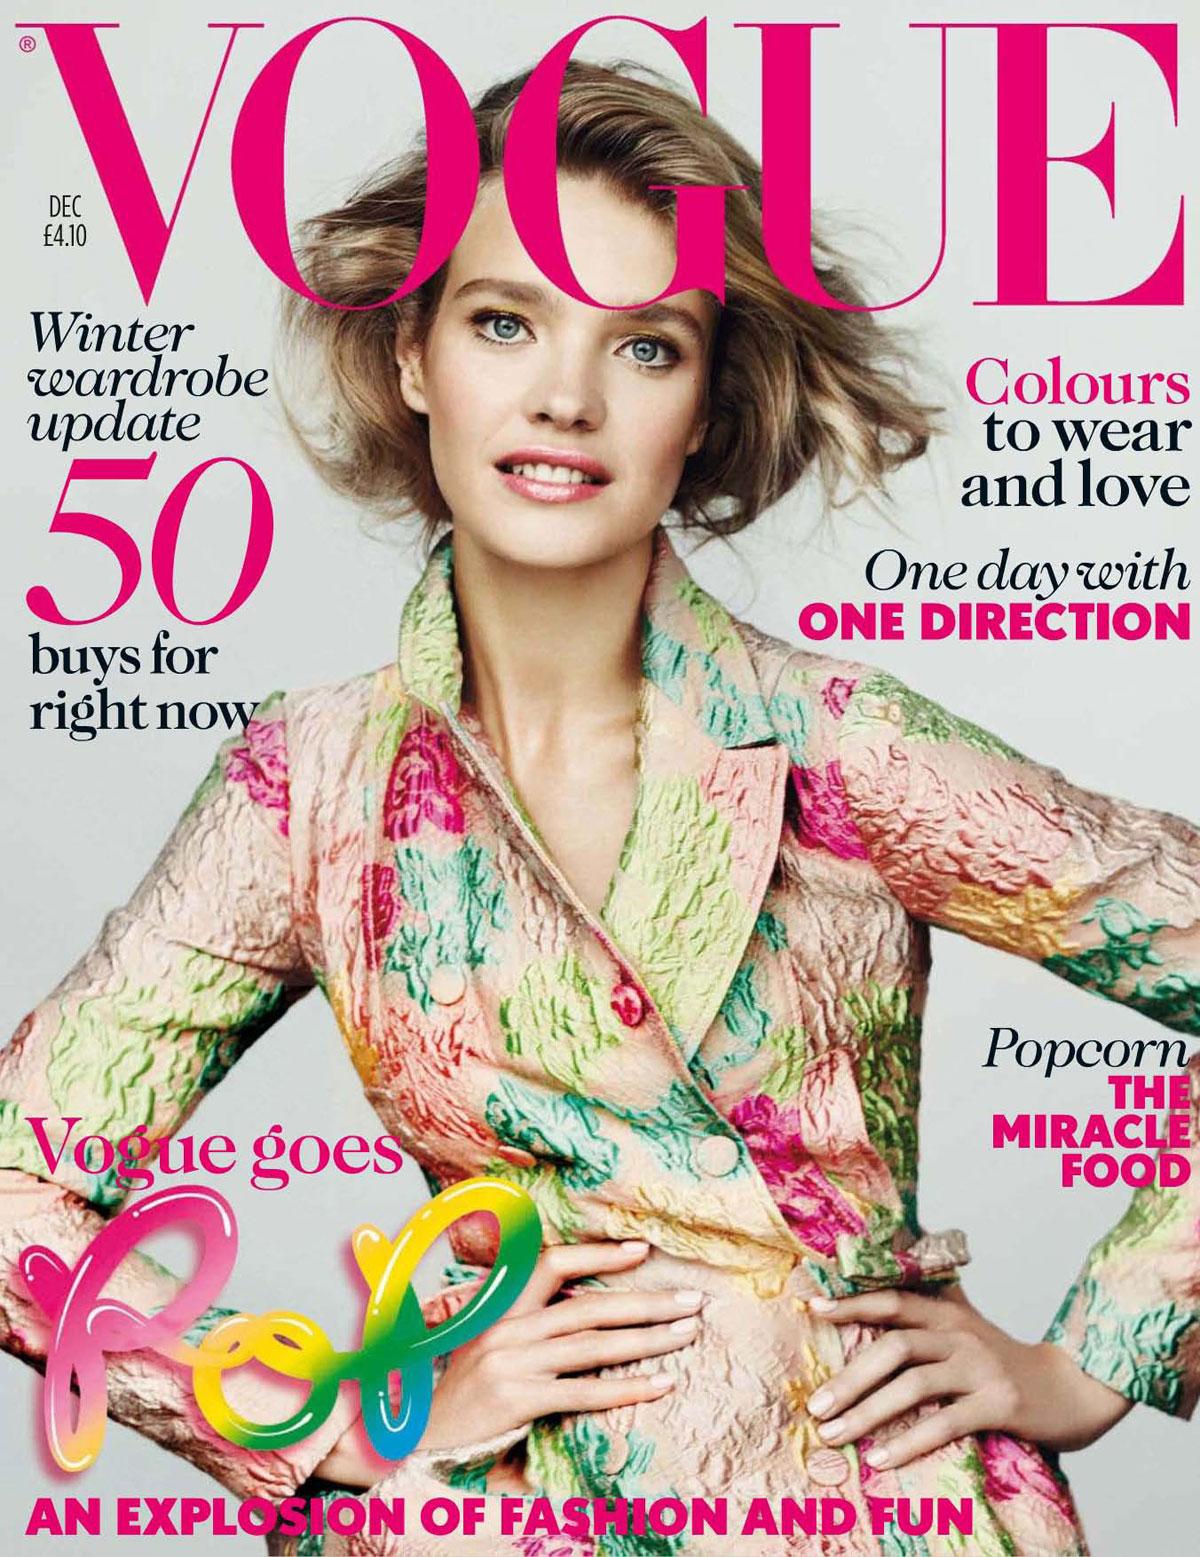 Vogue Magazine Subscription: NATALIA VODIANOVA In Vogue Magazine, UK December 2012